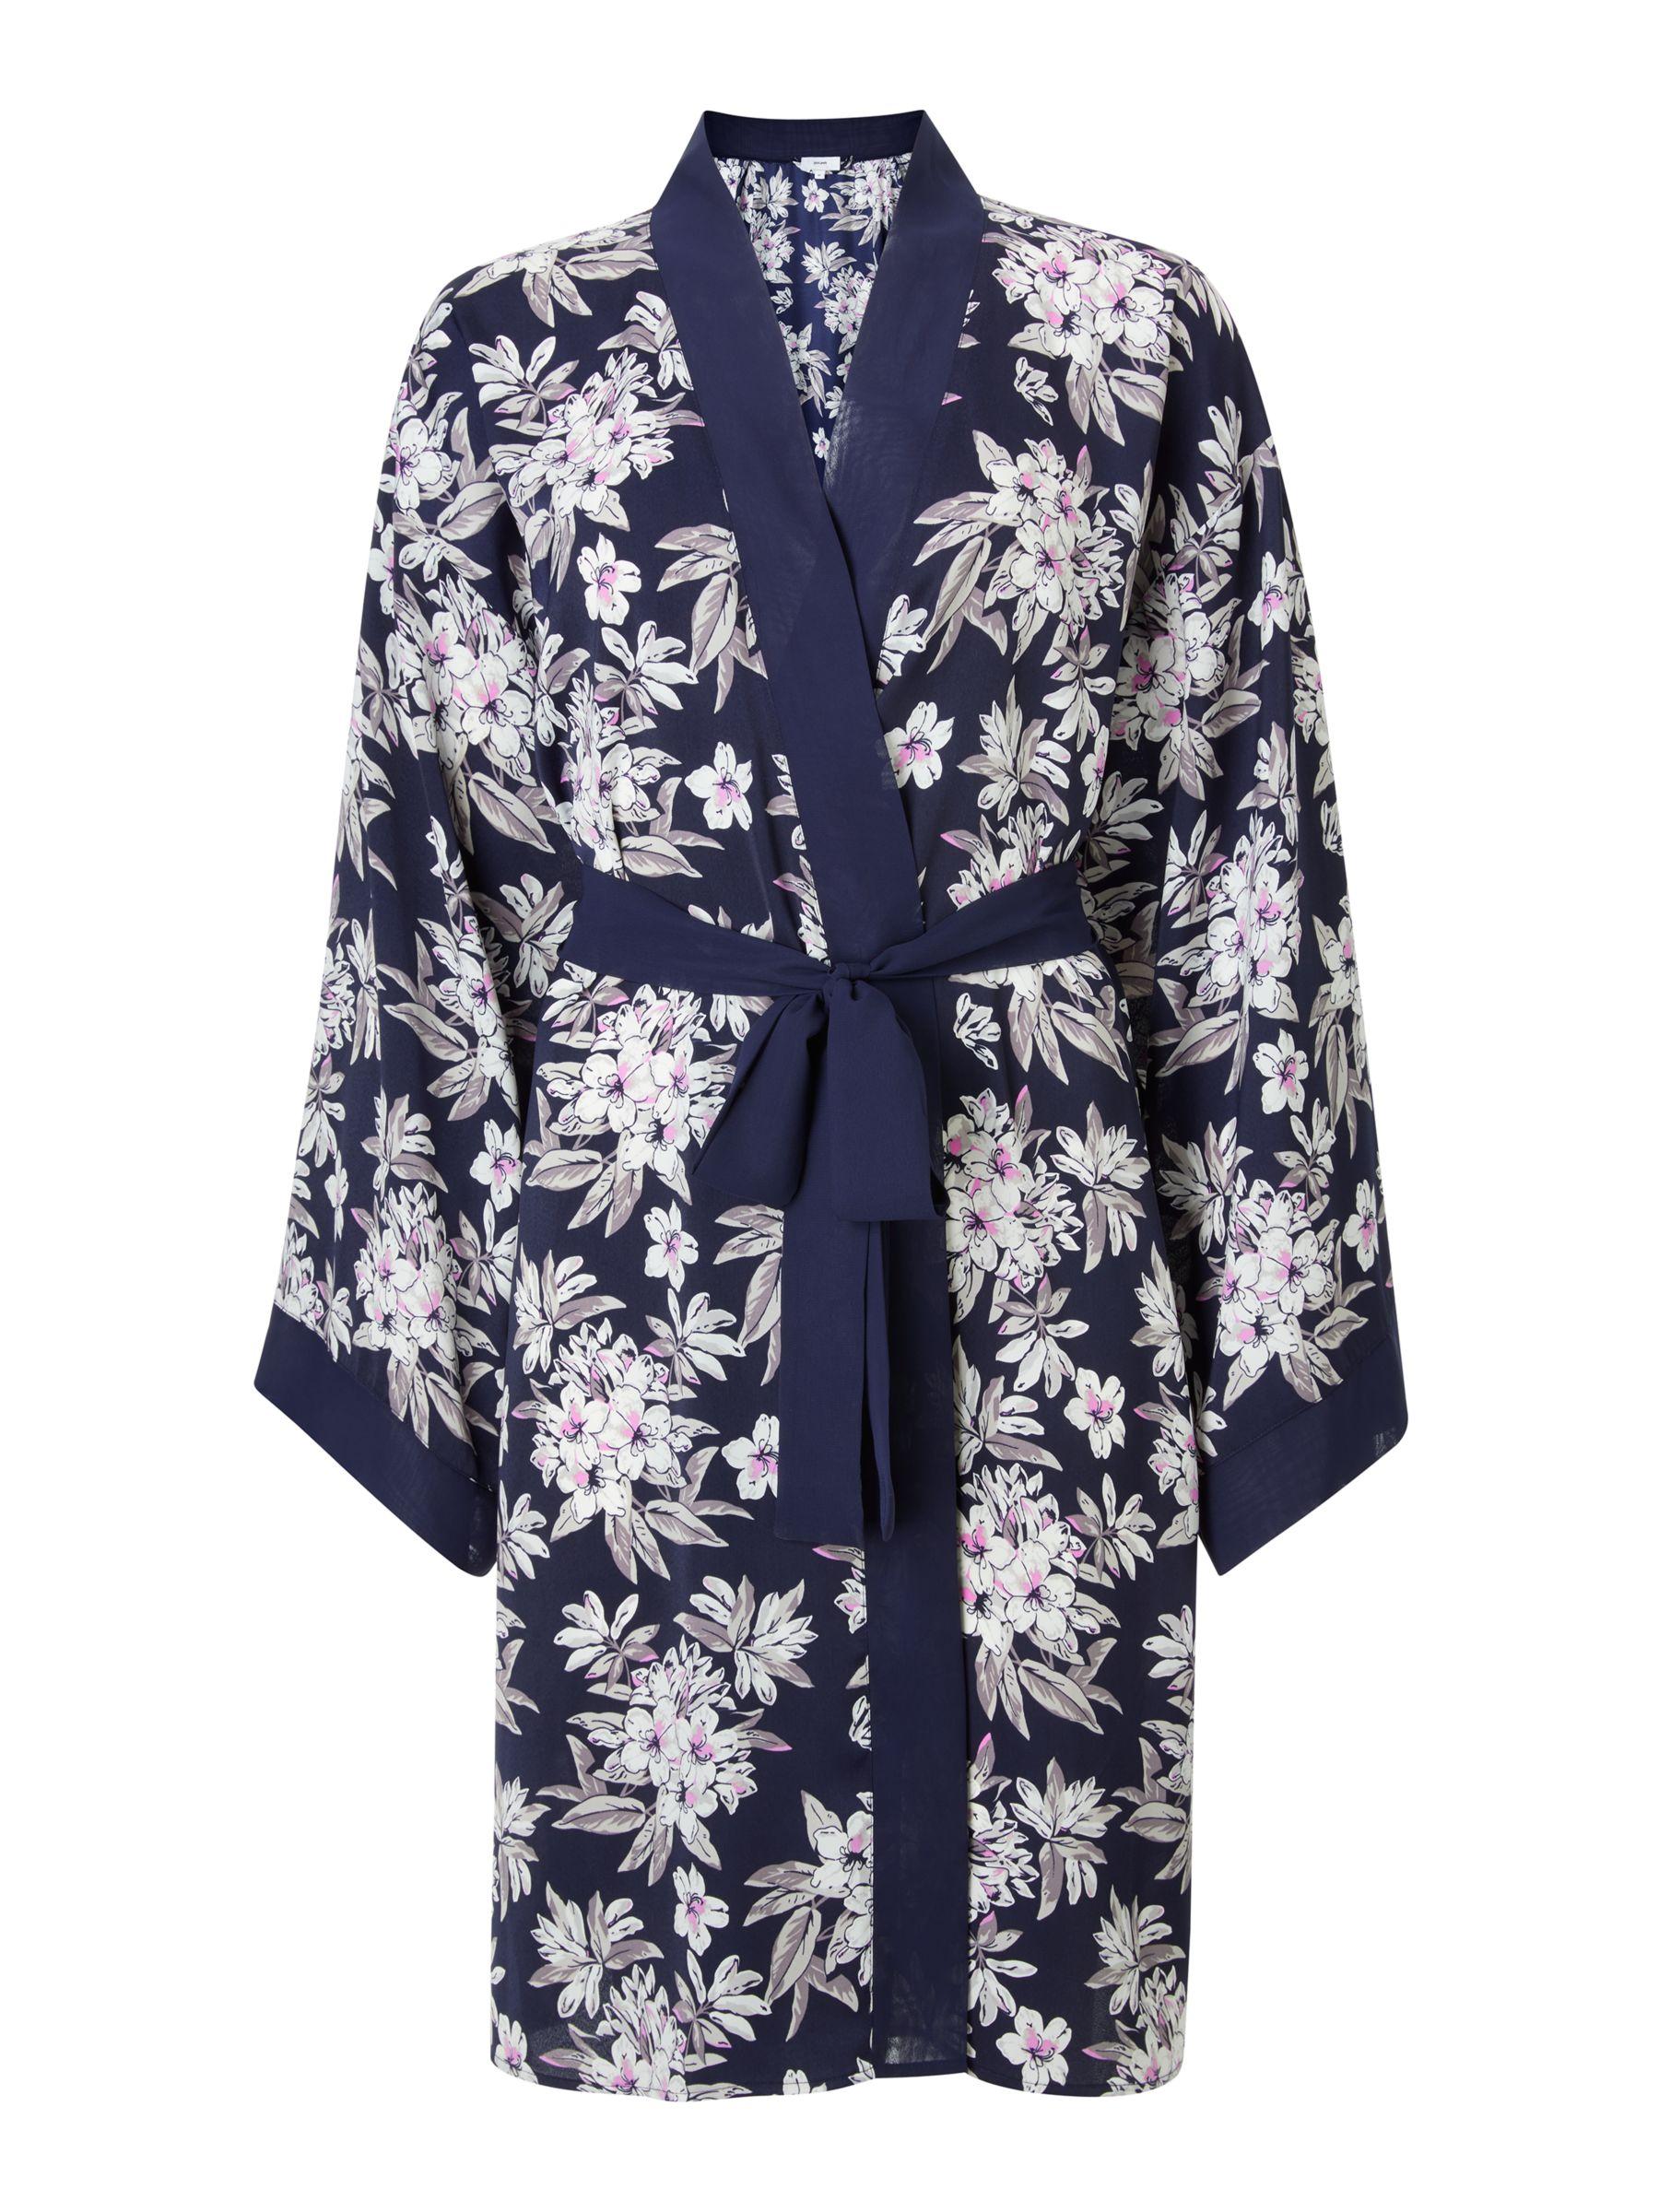 John Lewis Partners Odette Floral Satin Dressing Gown Blue At John Lewis Partners